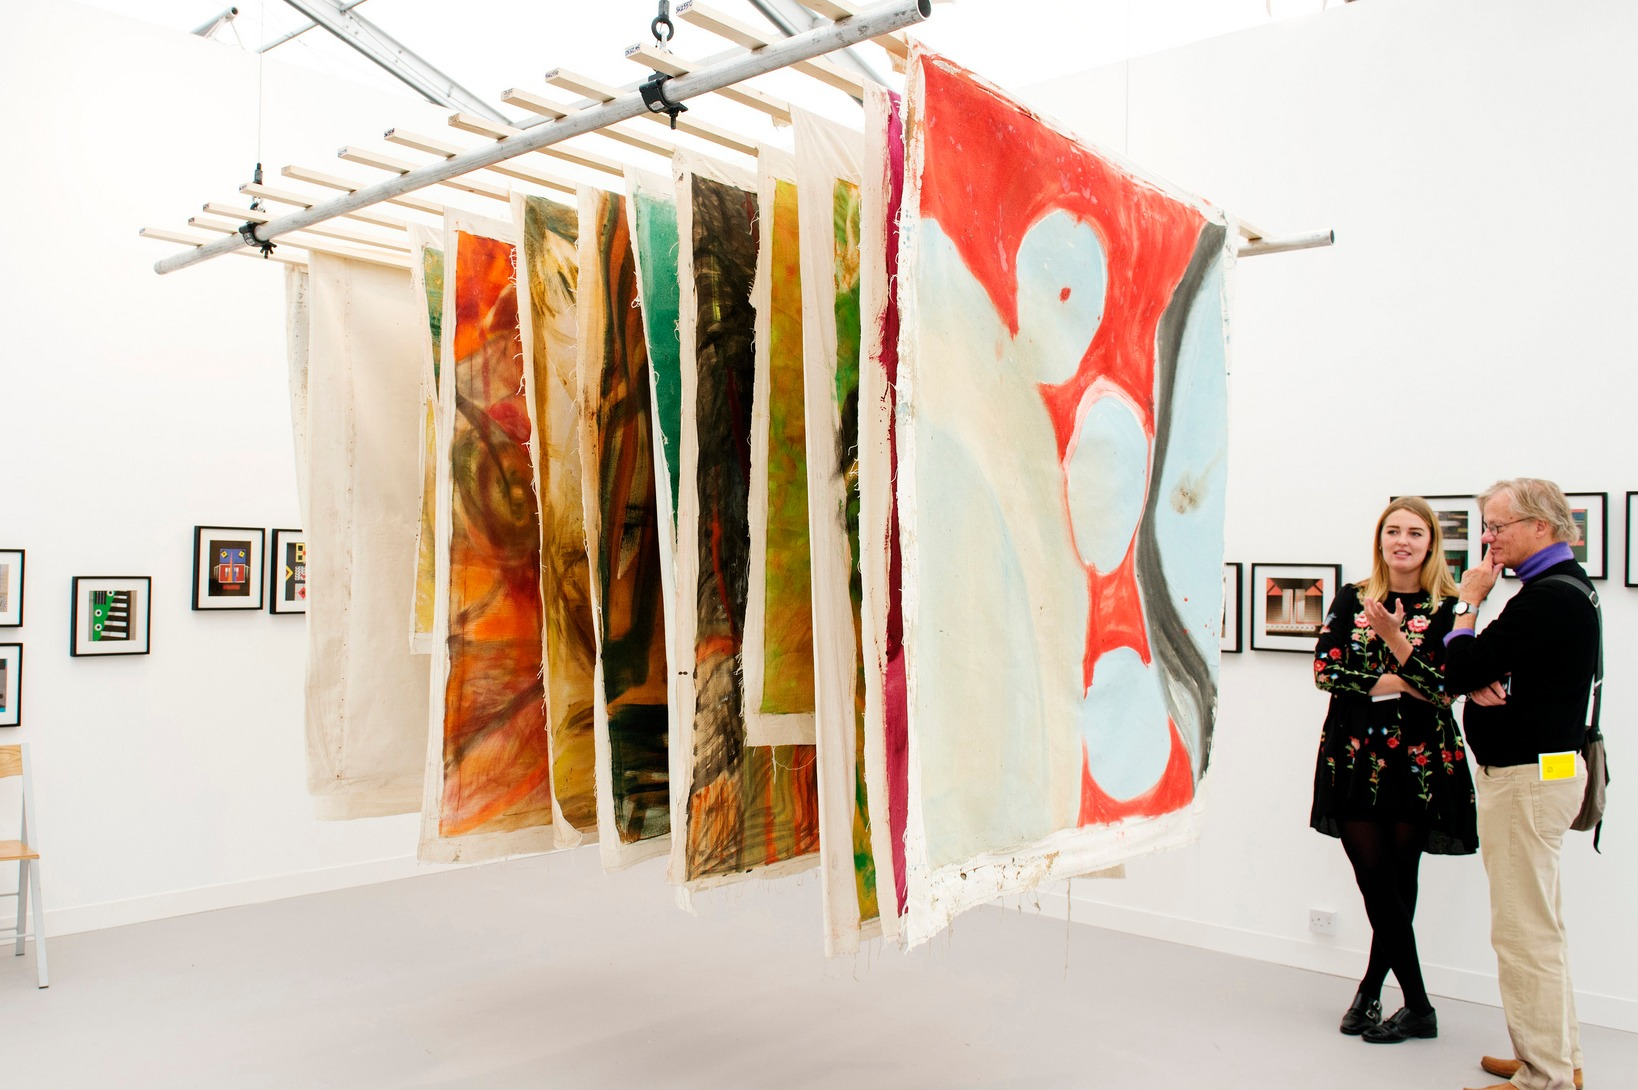 Visitors admiring art work at Frieze Art Fair